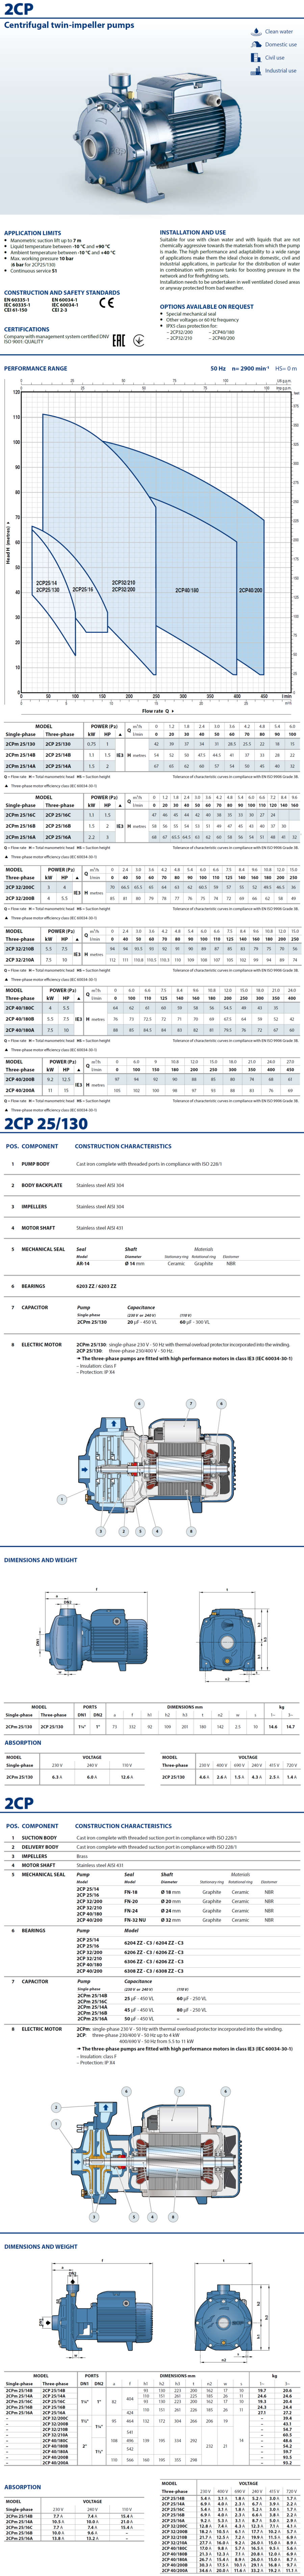 Pedrollo Data Sheet 2CPm25/14B